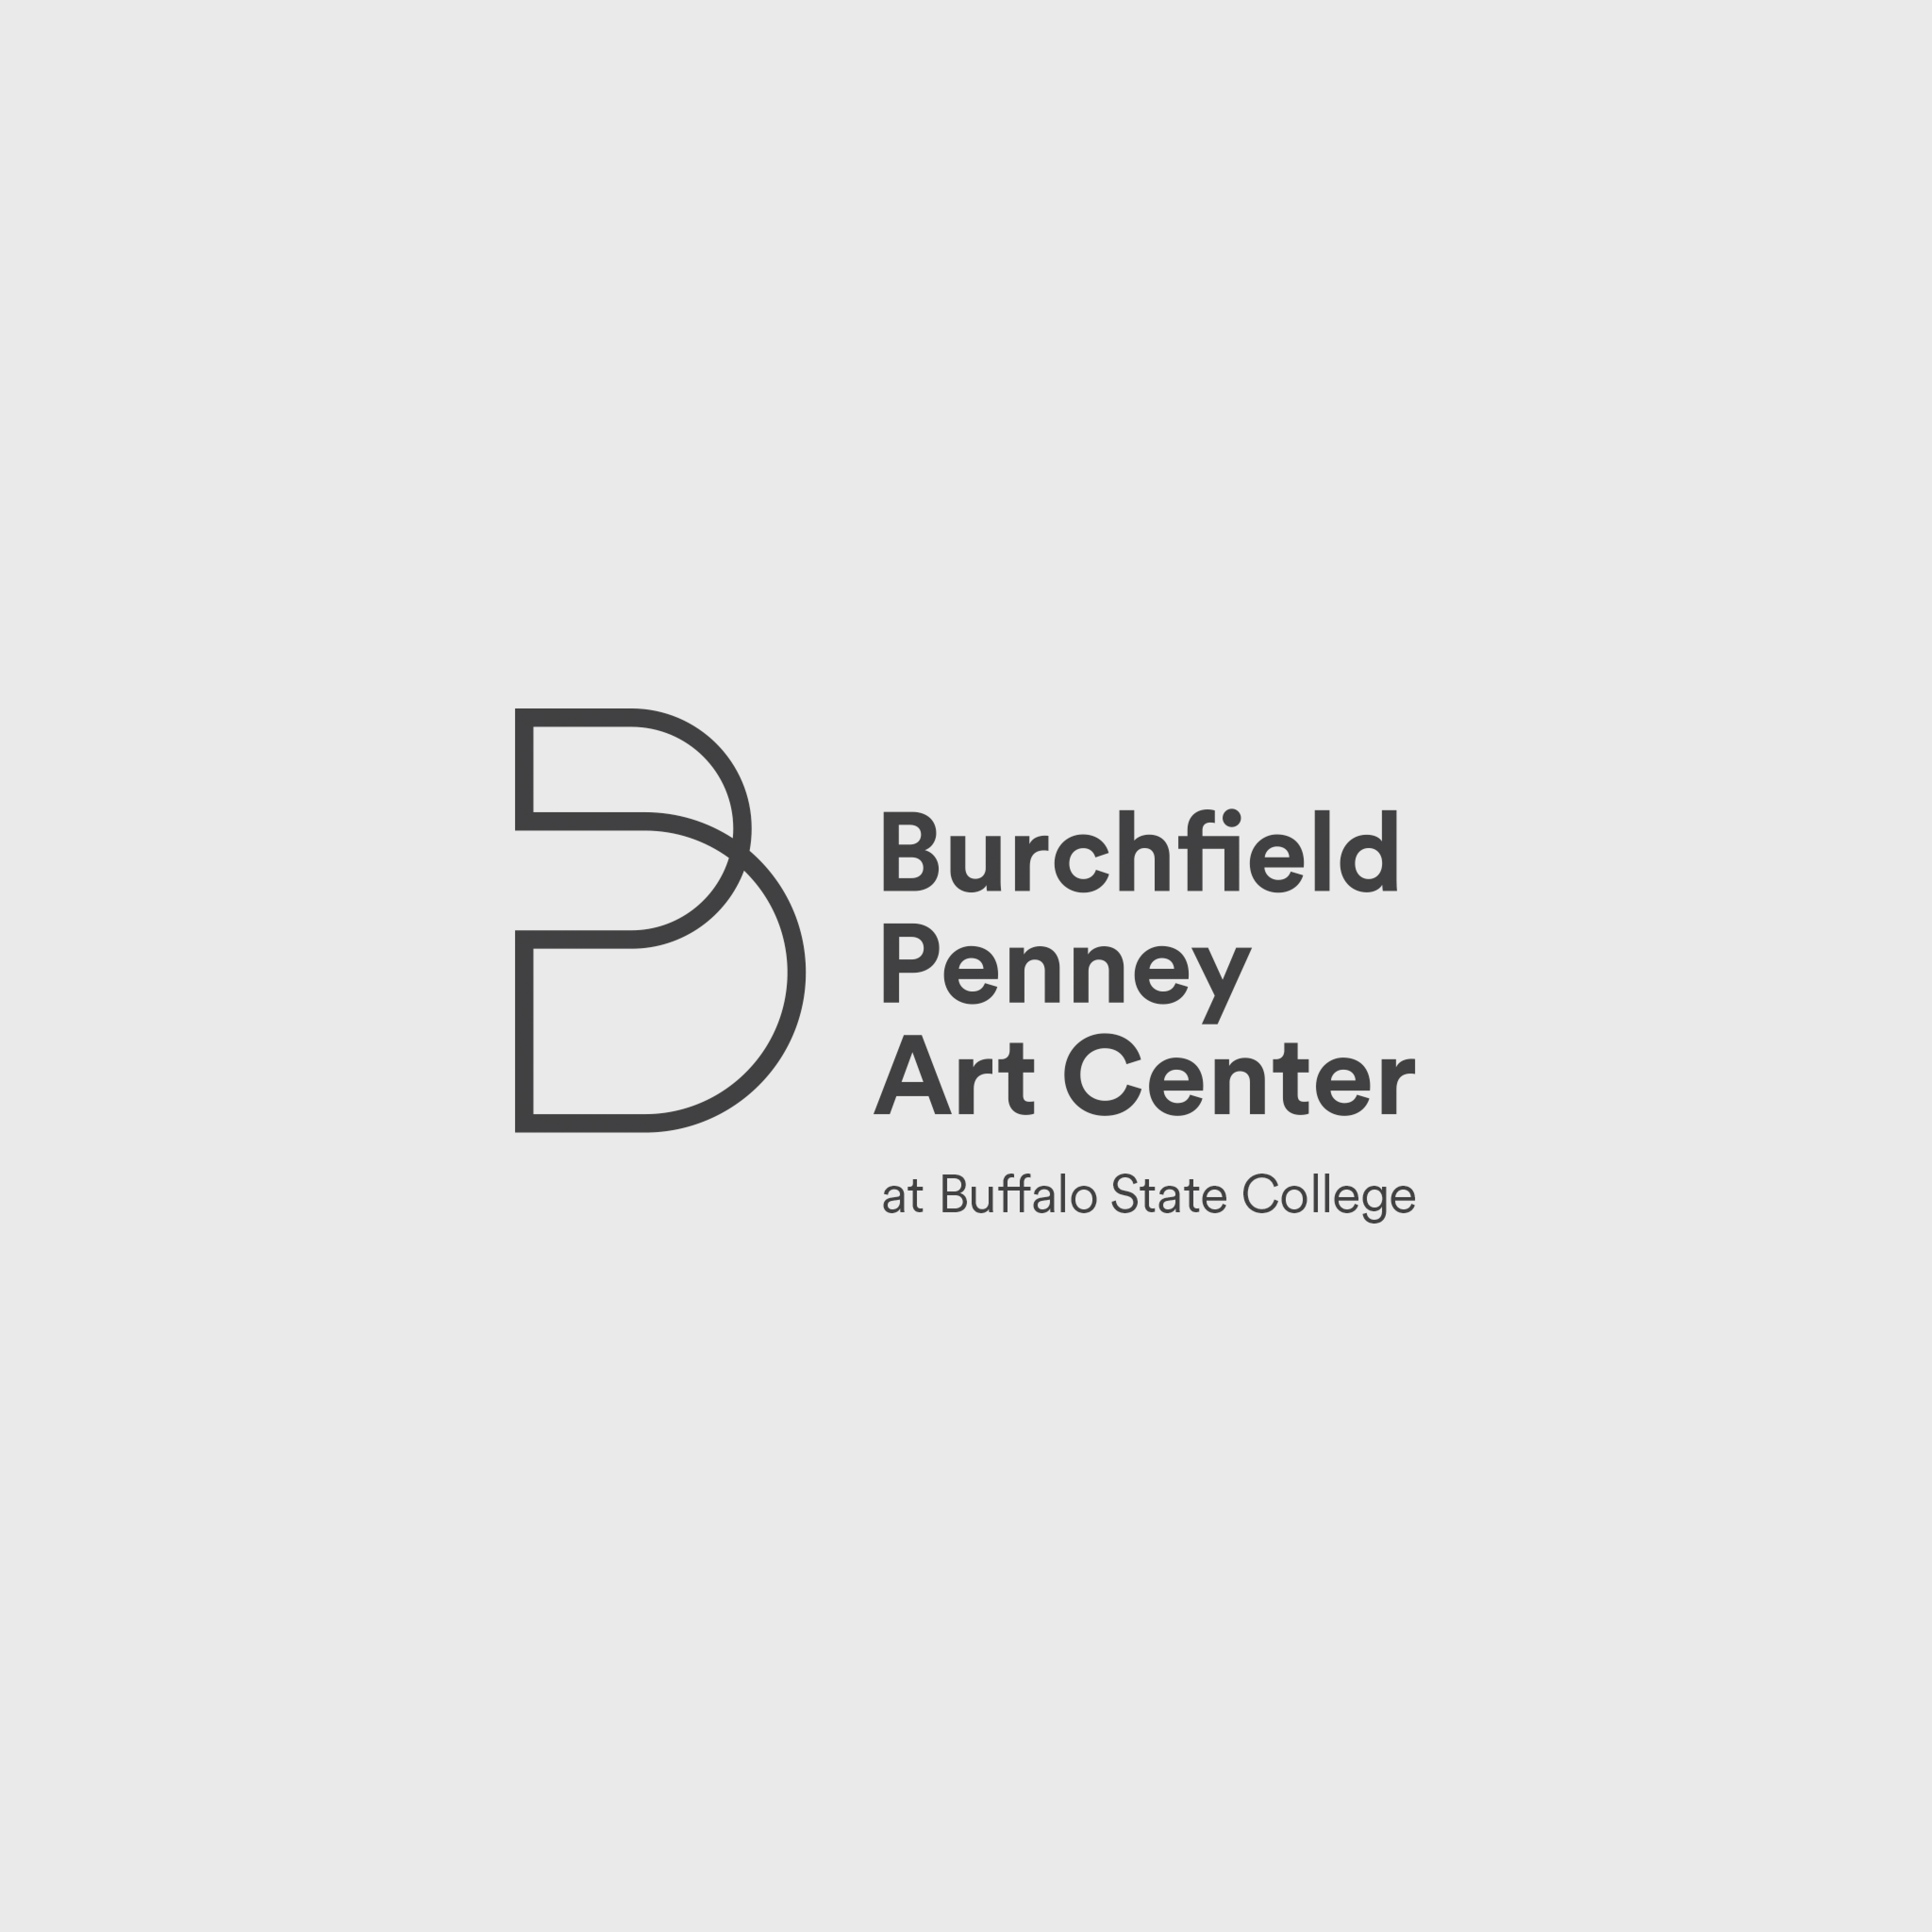 kids shop online the museum store visit burchfield penney art center. Black Bedroom Furniture Sets. Home Design Ideas